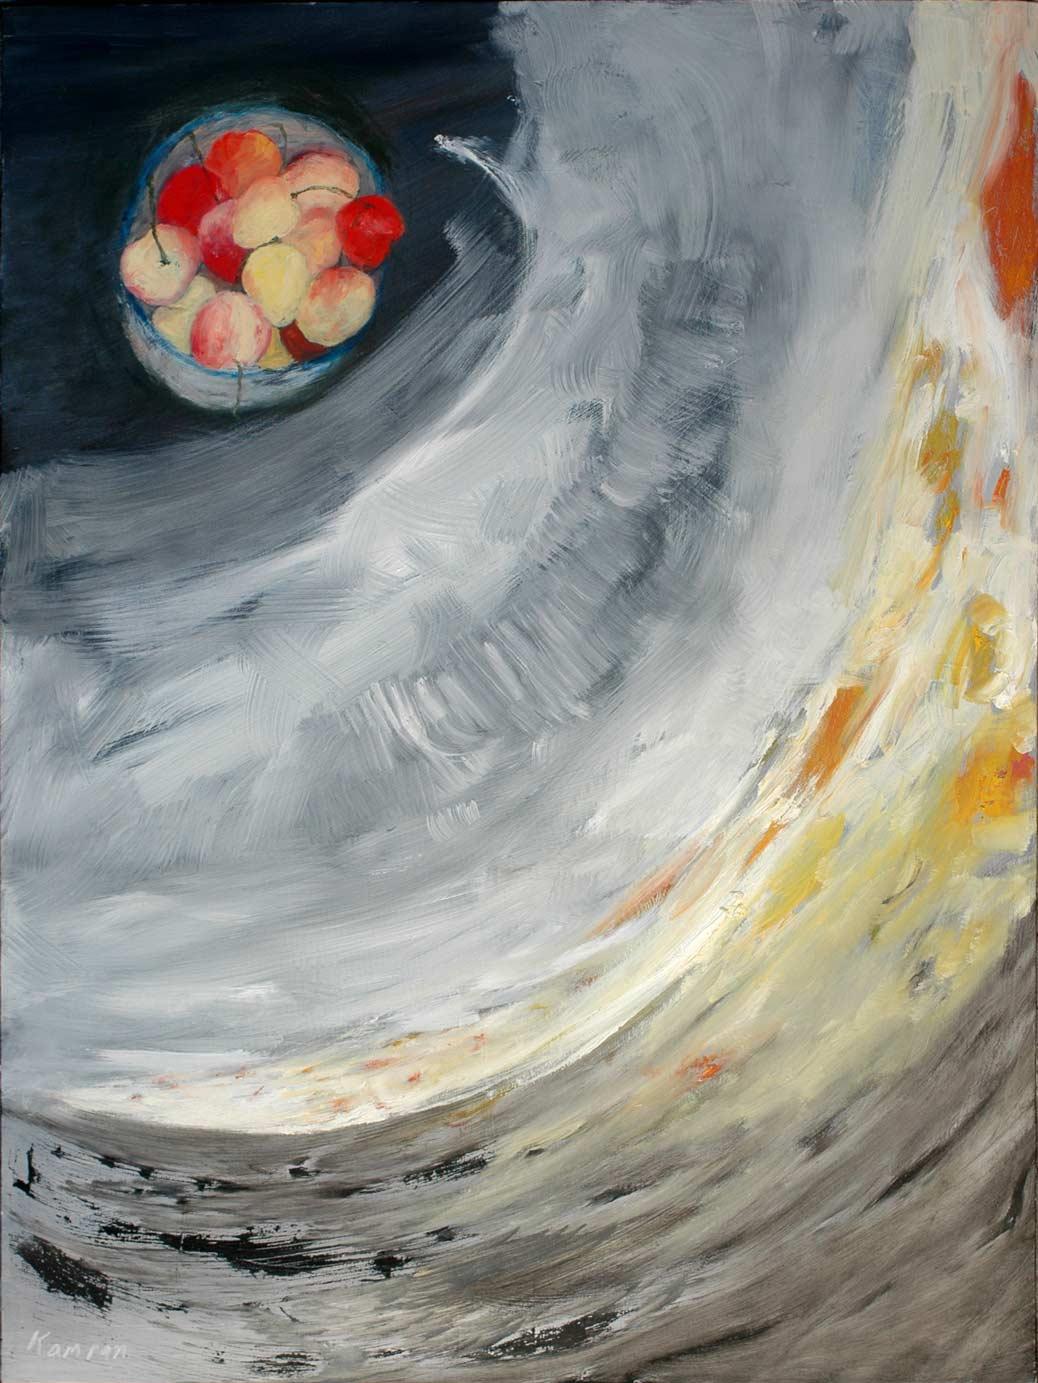 Eye of the Cyclone